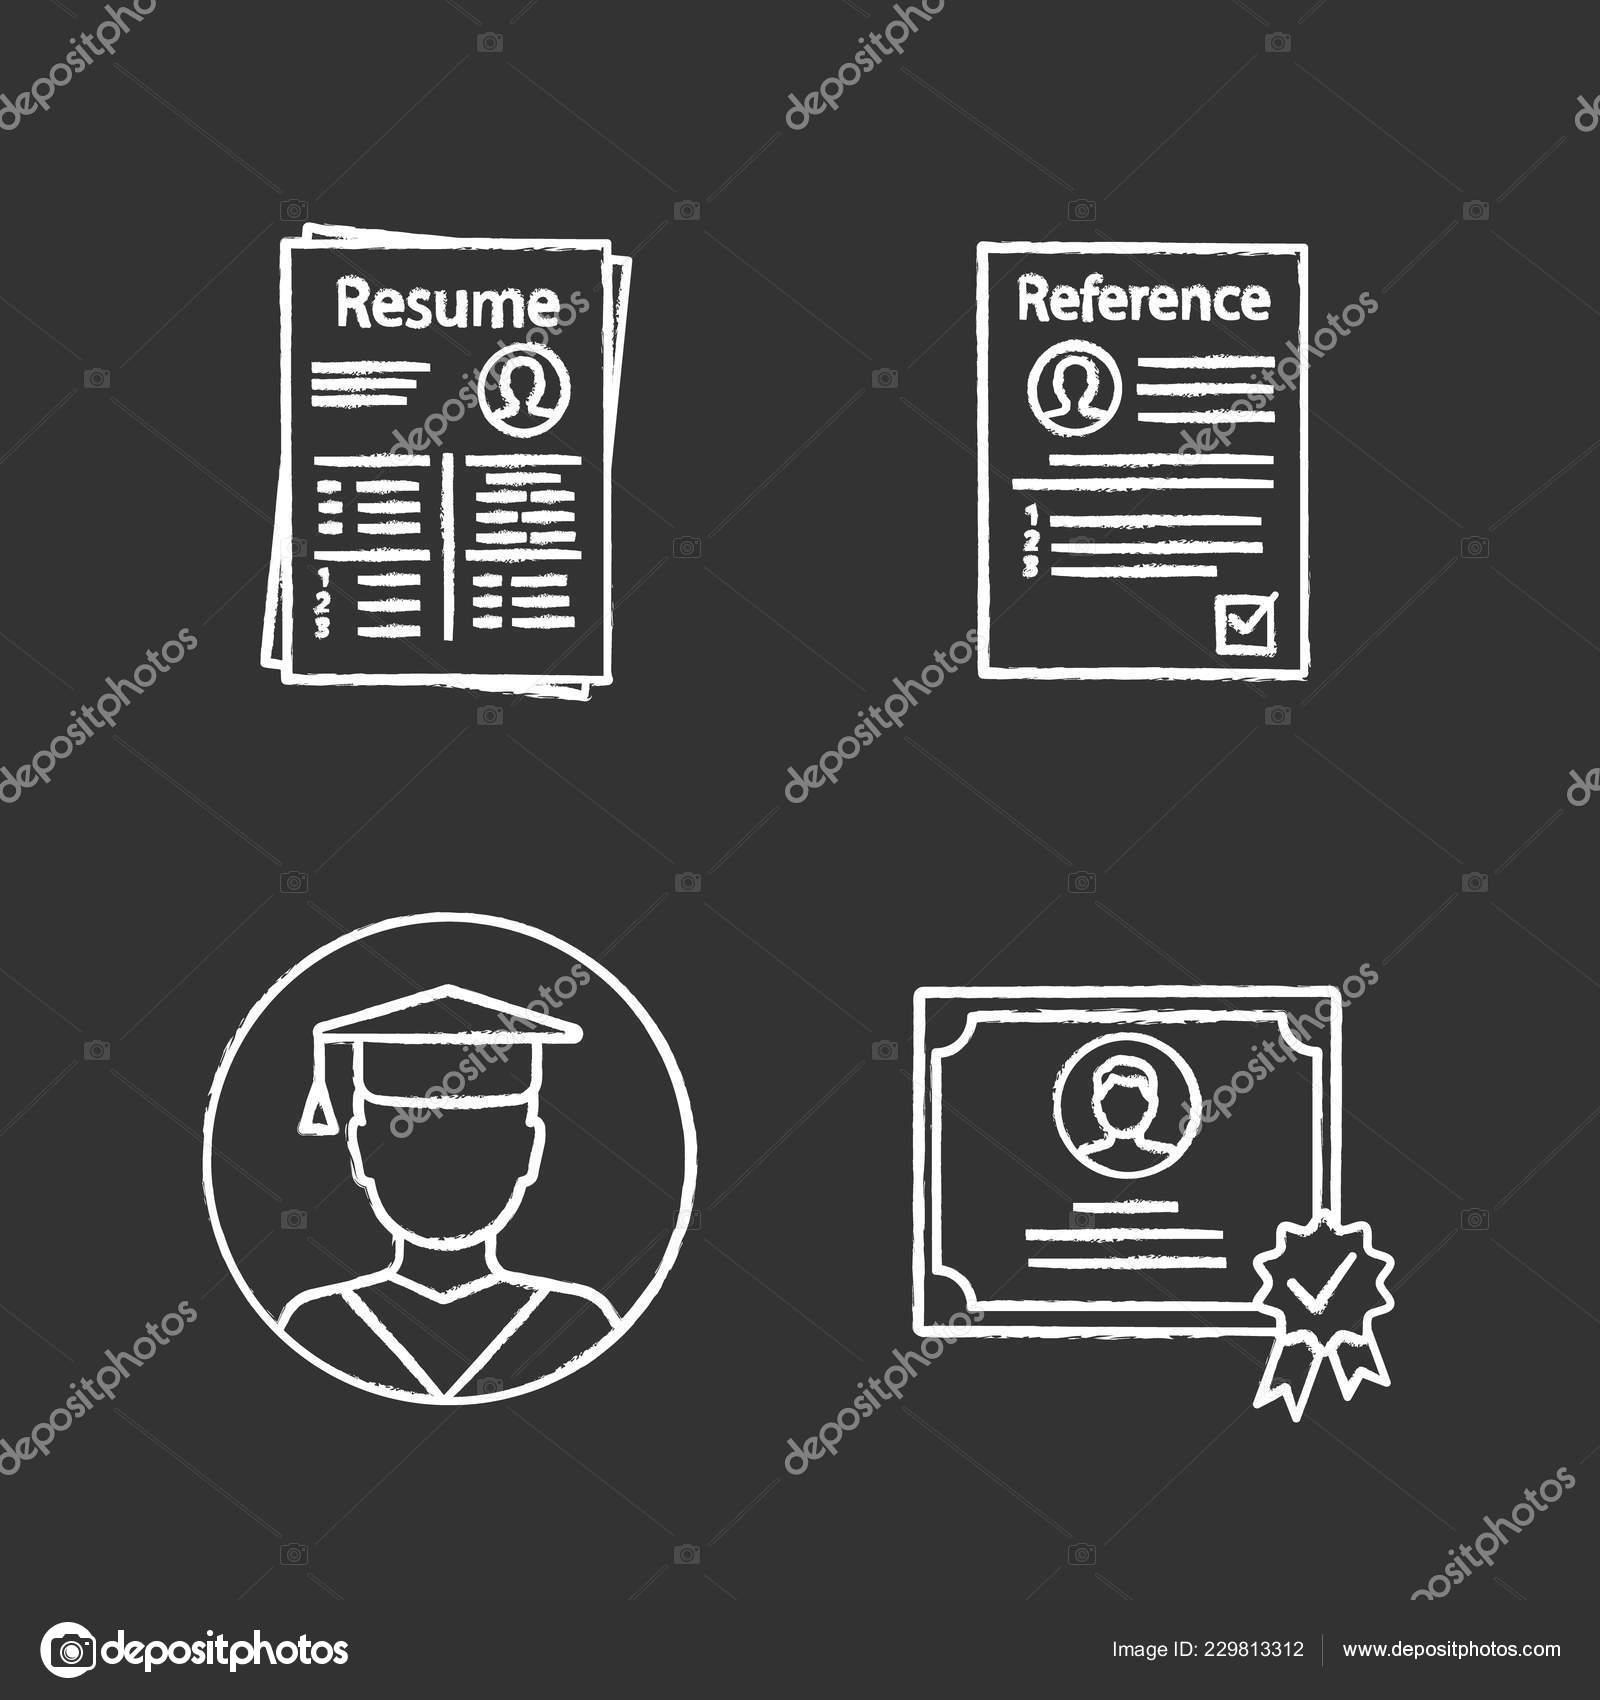 Resume Chalk Icons Black Background Stock Vector C Bsd 229813312